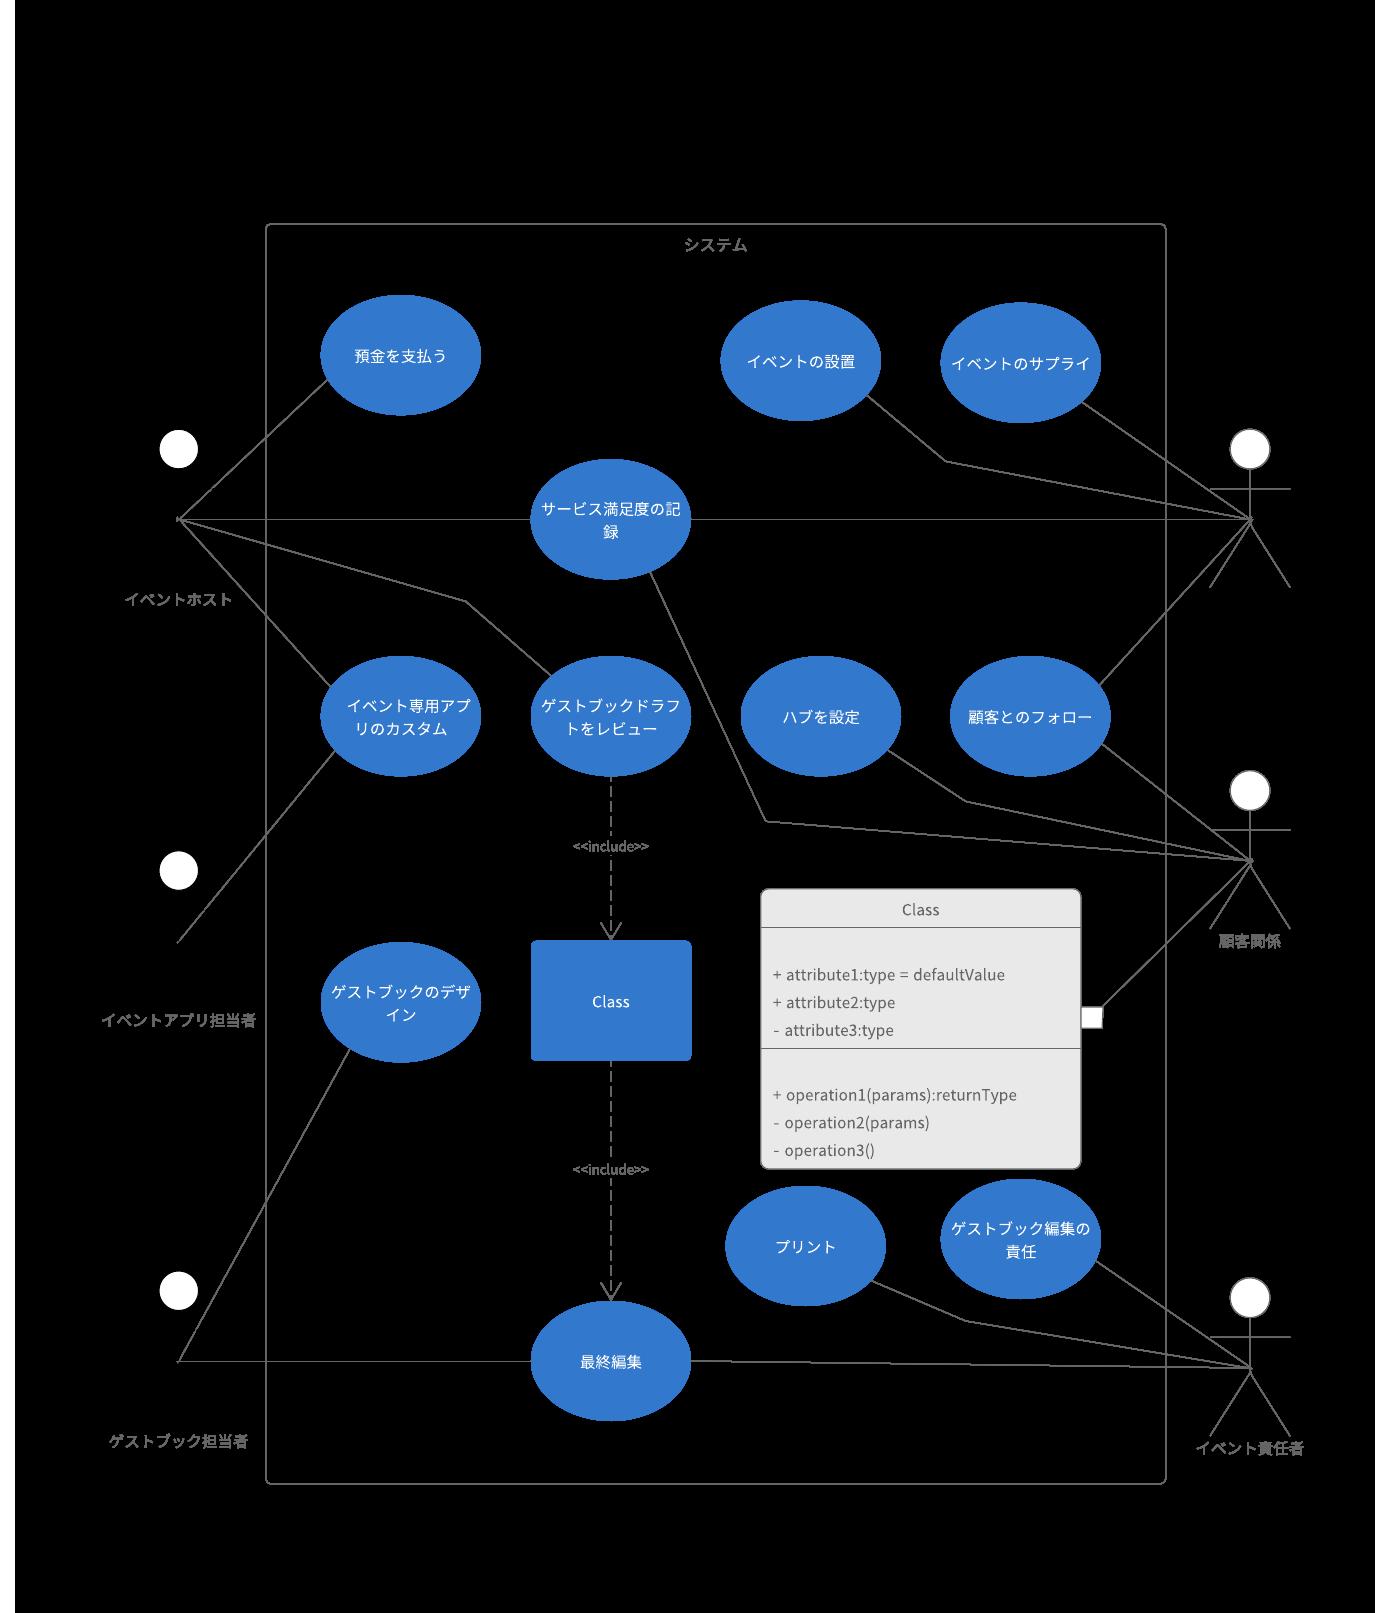 UMLユースケース図の紹介と参考サンプル